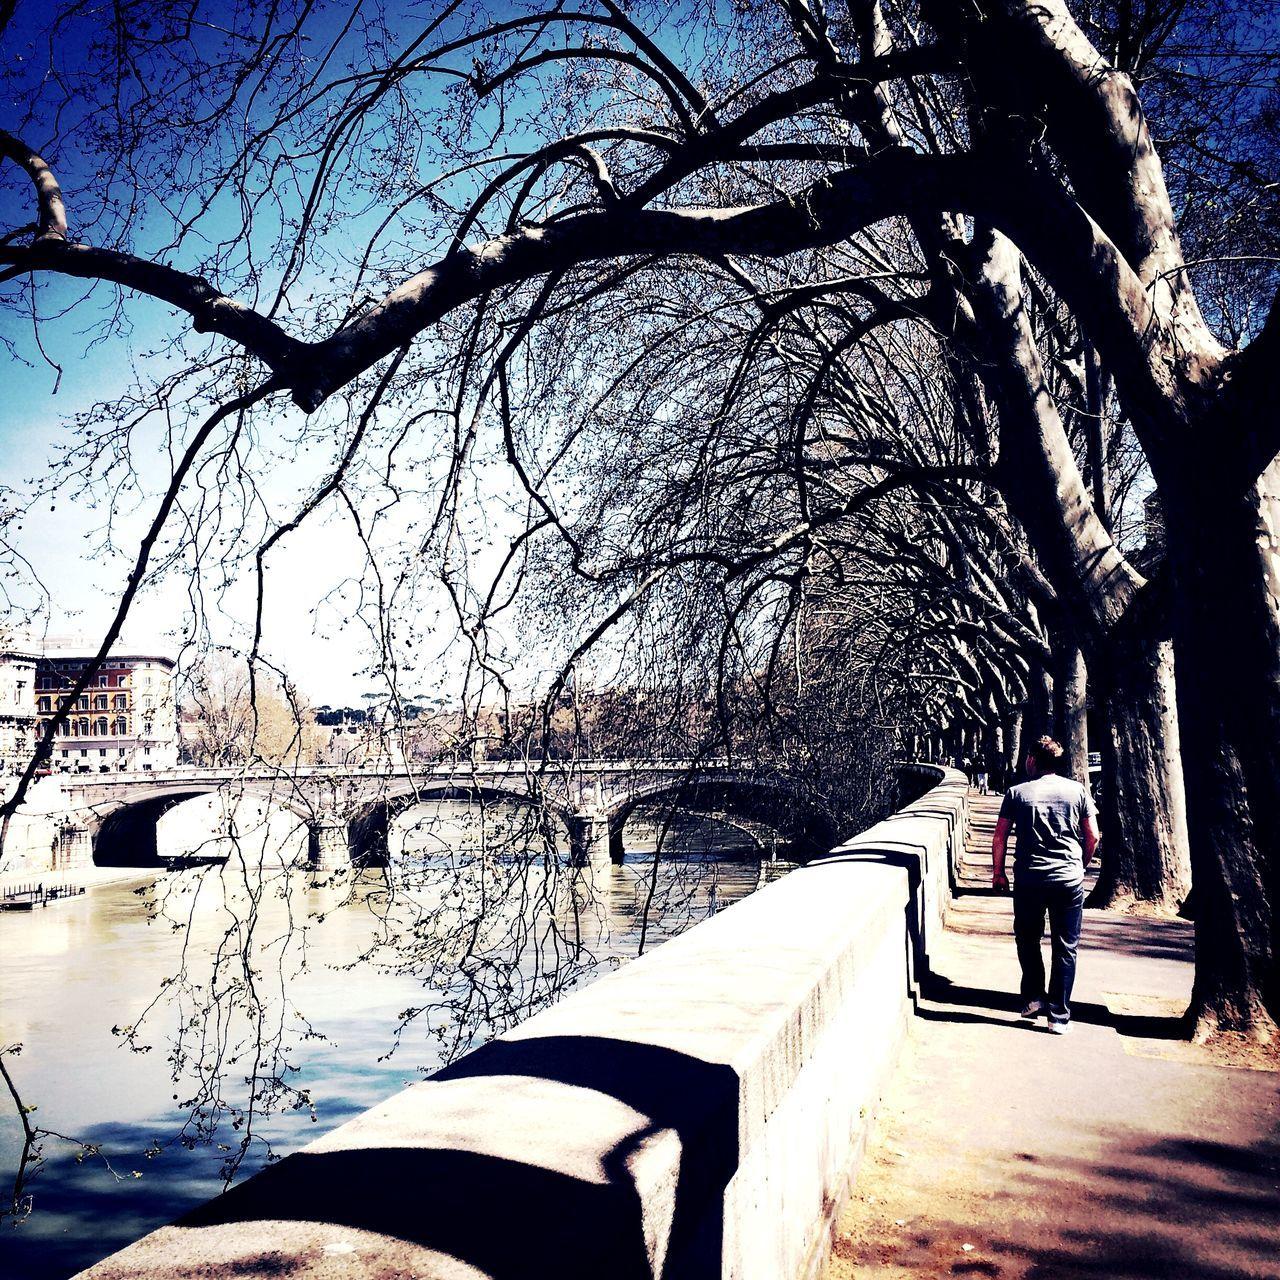 Bridge Over Canal Man Walking Along Retaining Wall